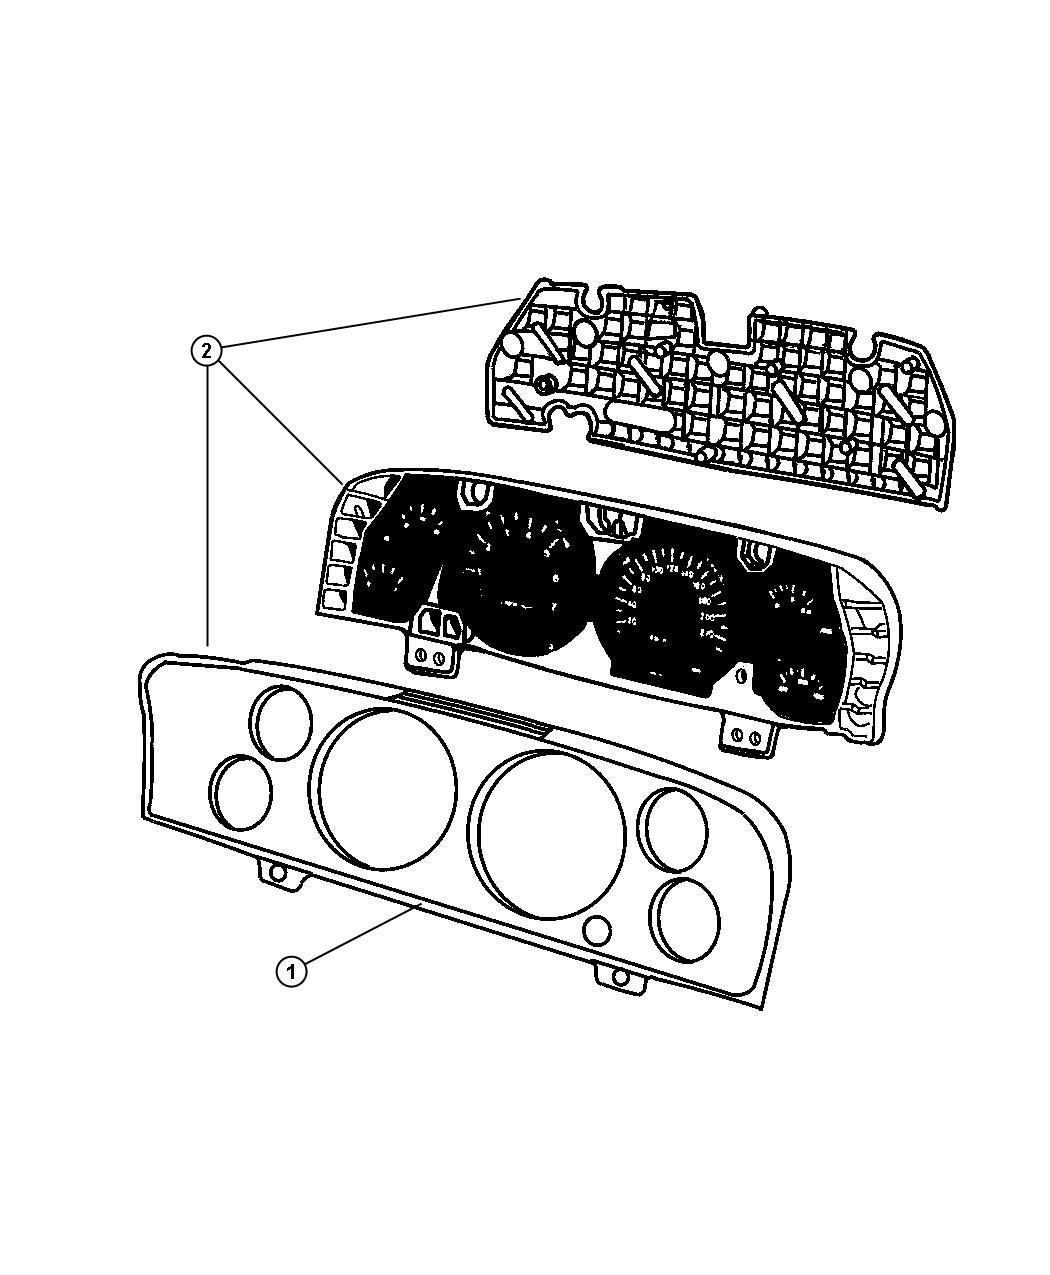 Jeep Commander Cluster Instrument Panel 230 Kph Primary Speedometer